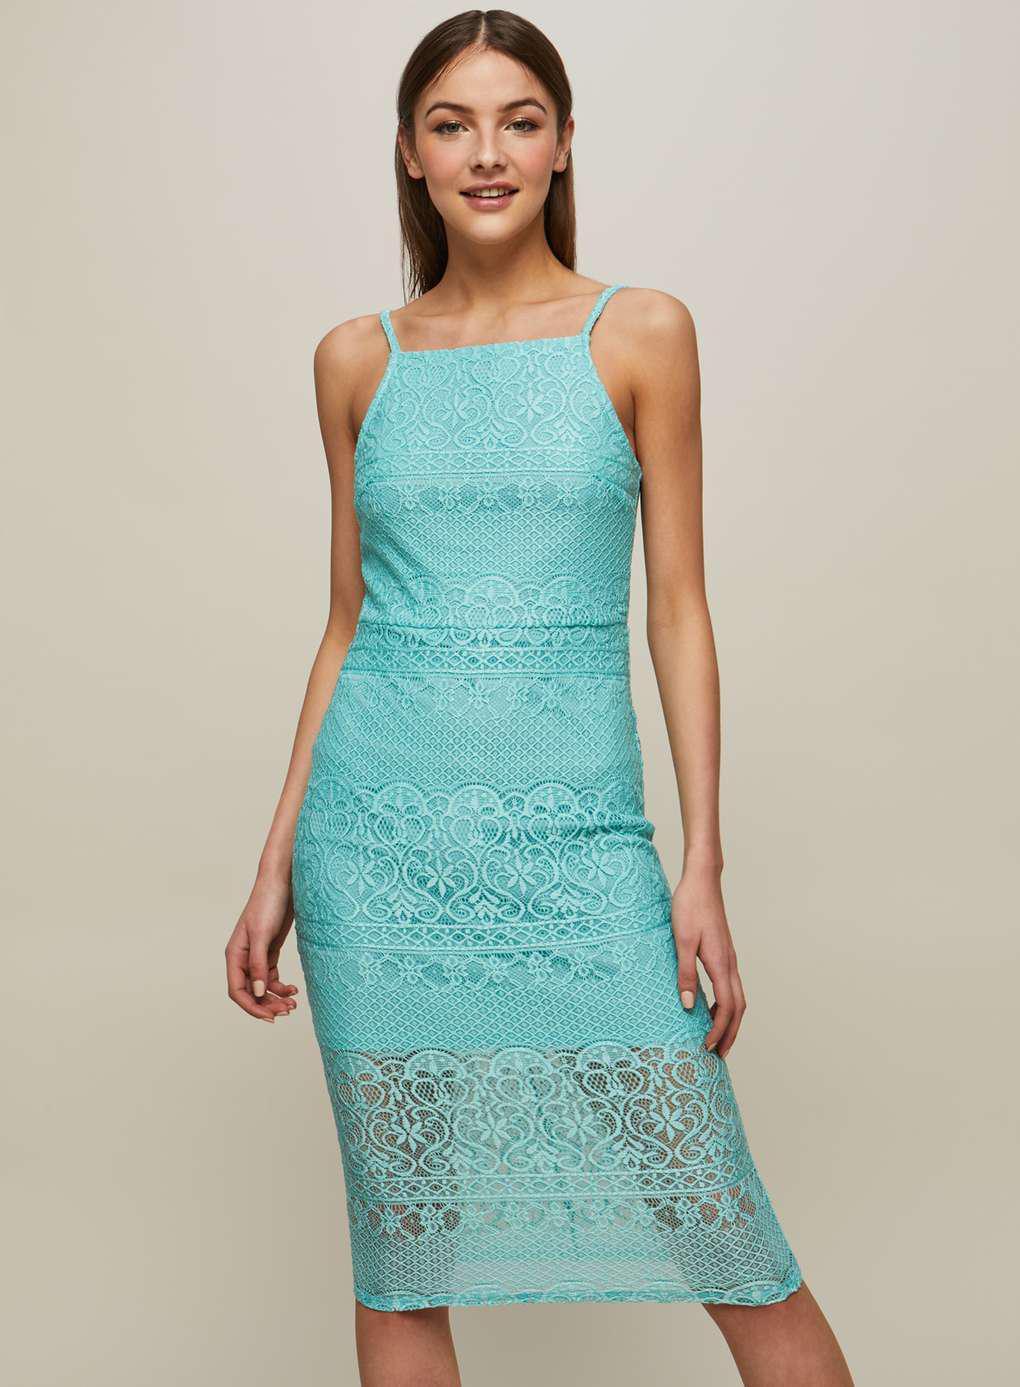 Dorable Miss Selfridge Party Dresses Images - All Wedding Dresses ...